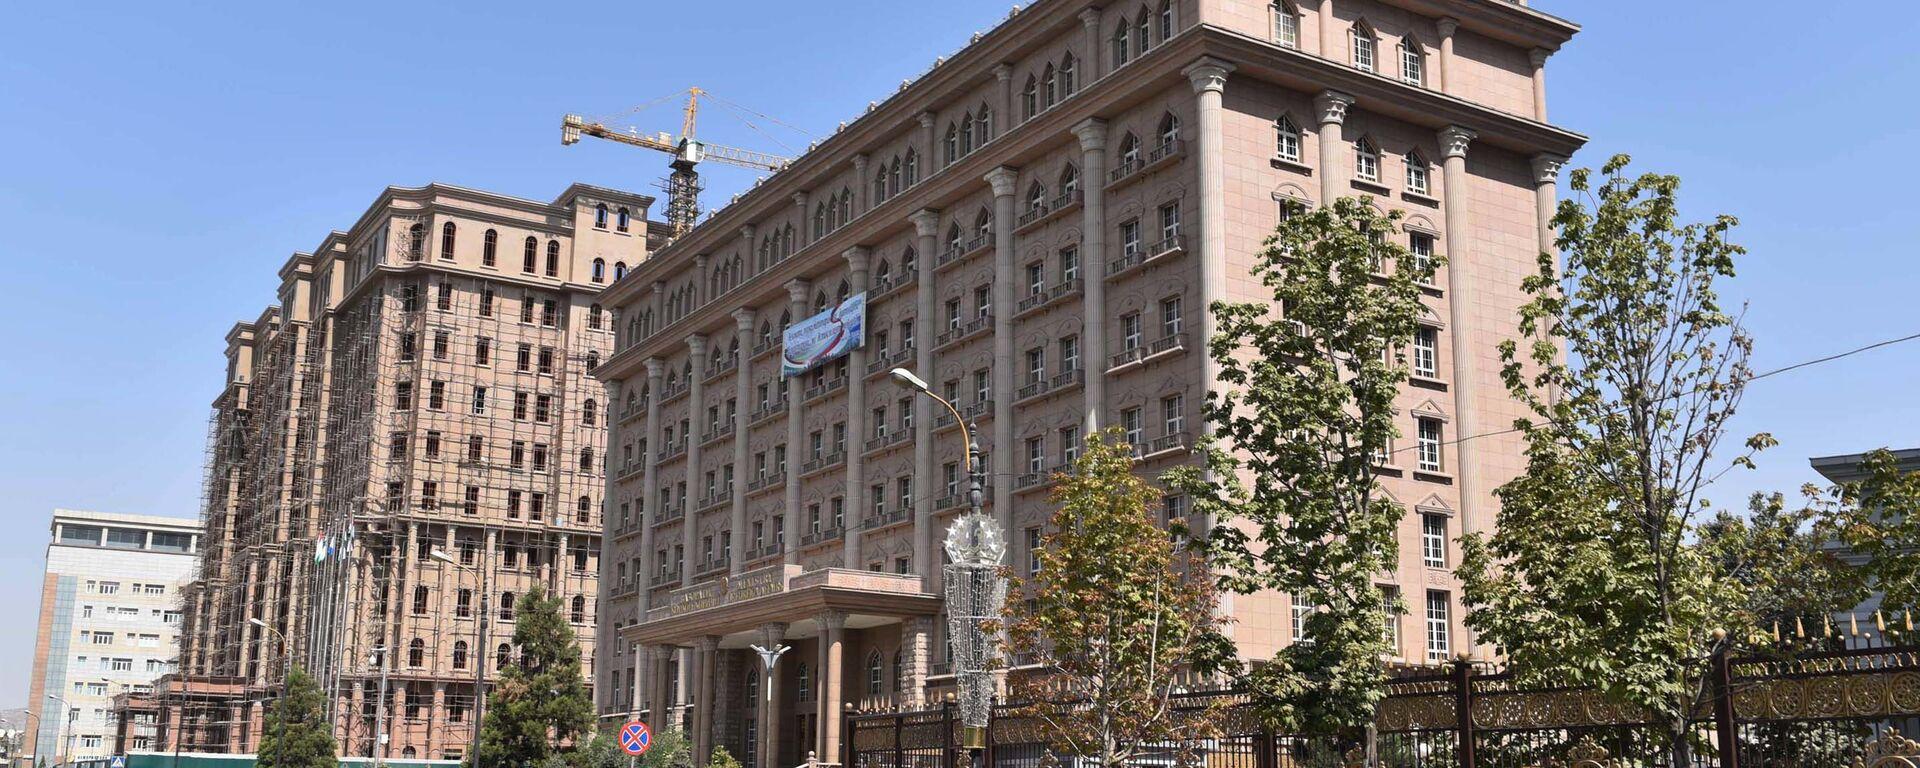 Здание МИД Таджикистана в Душанбе, архивное фото - Sputnik Таджикистан, 1920, 14.03.2020